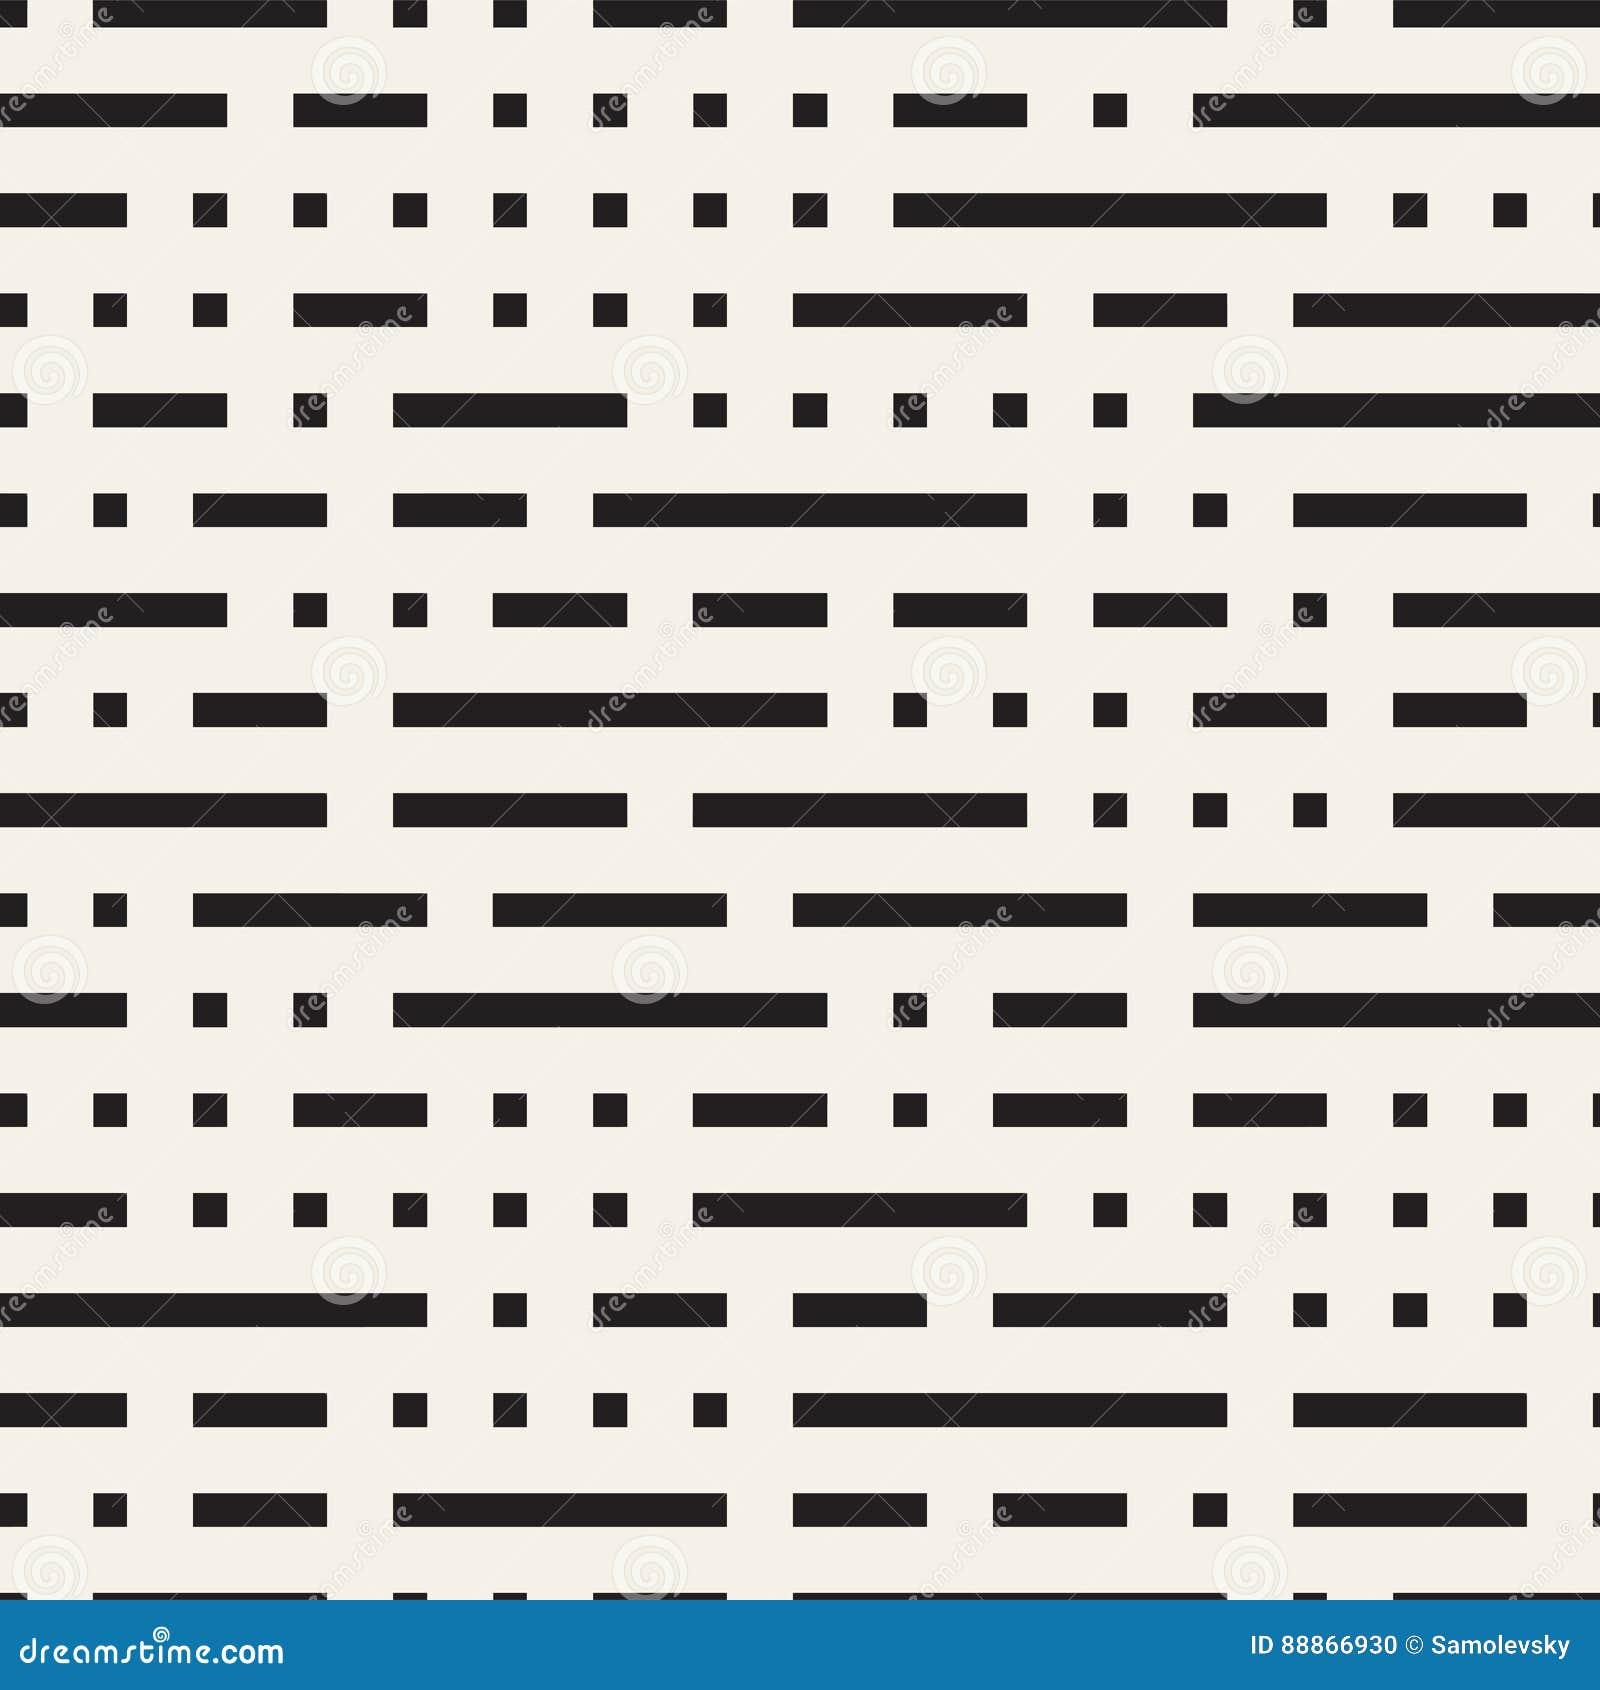 Diseño irregular de Maze Shapes Tiling Contemporary Graphic Modelo blanco y negro inconsútil del vector